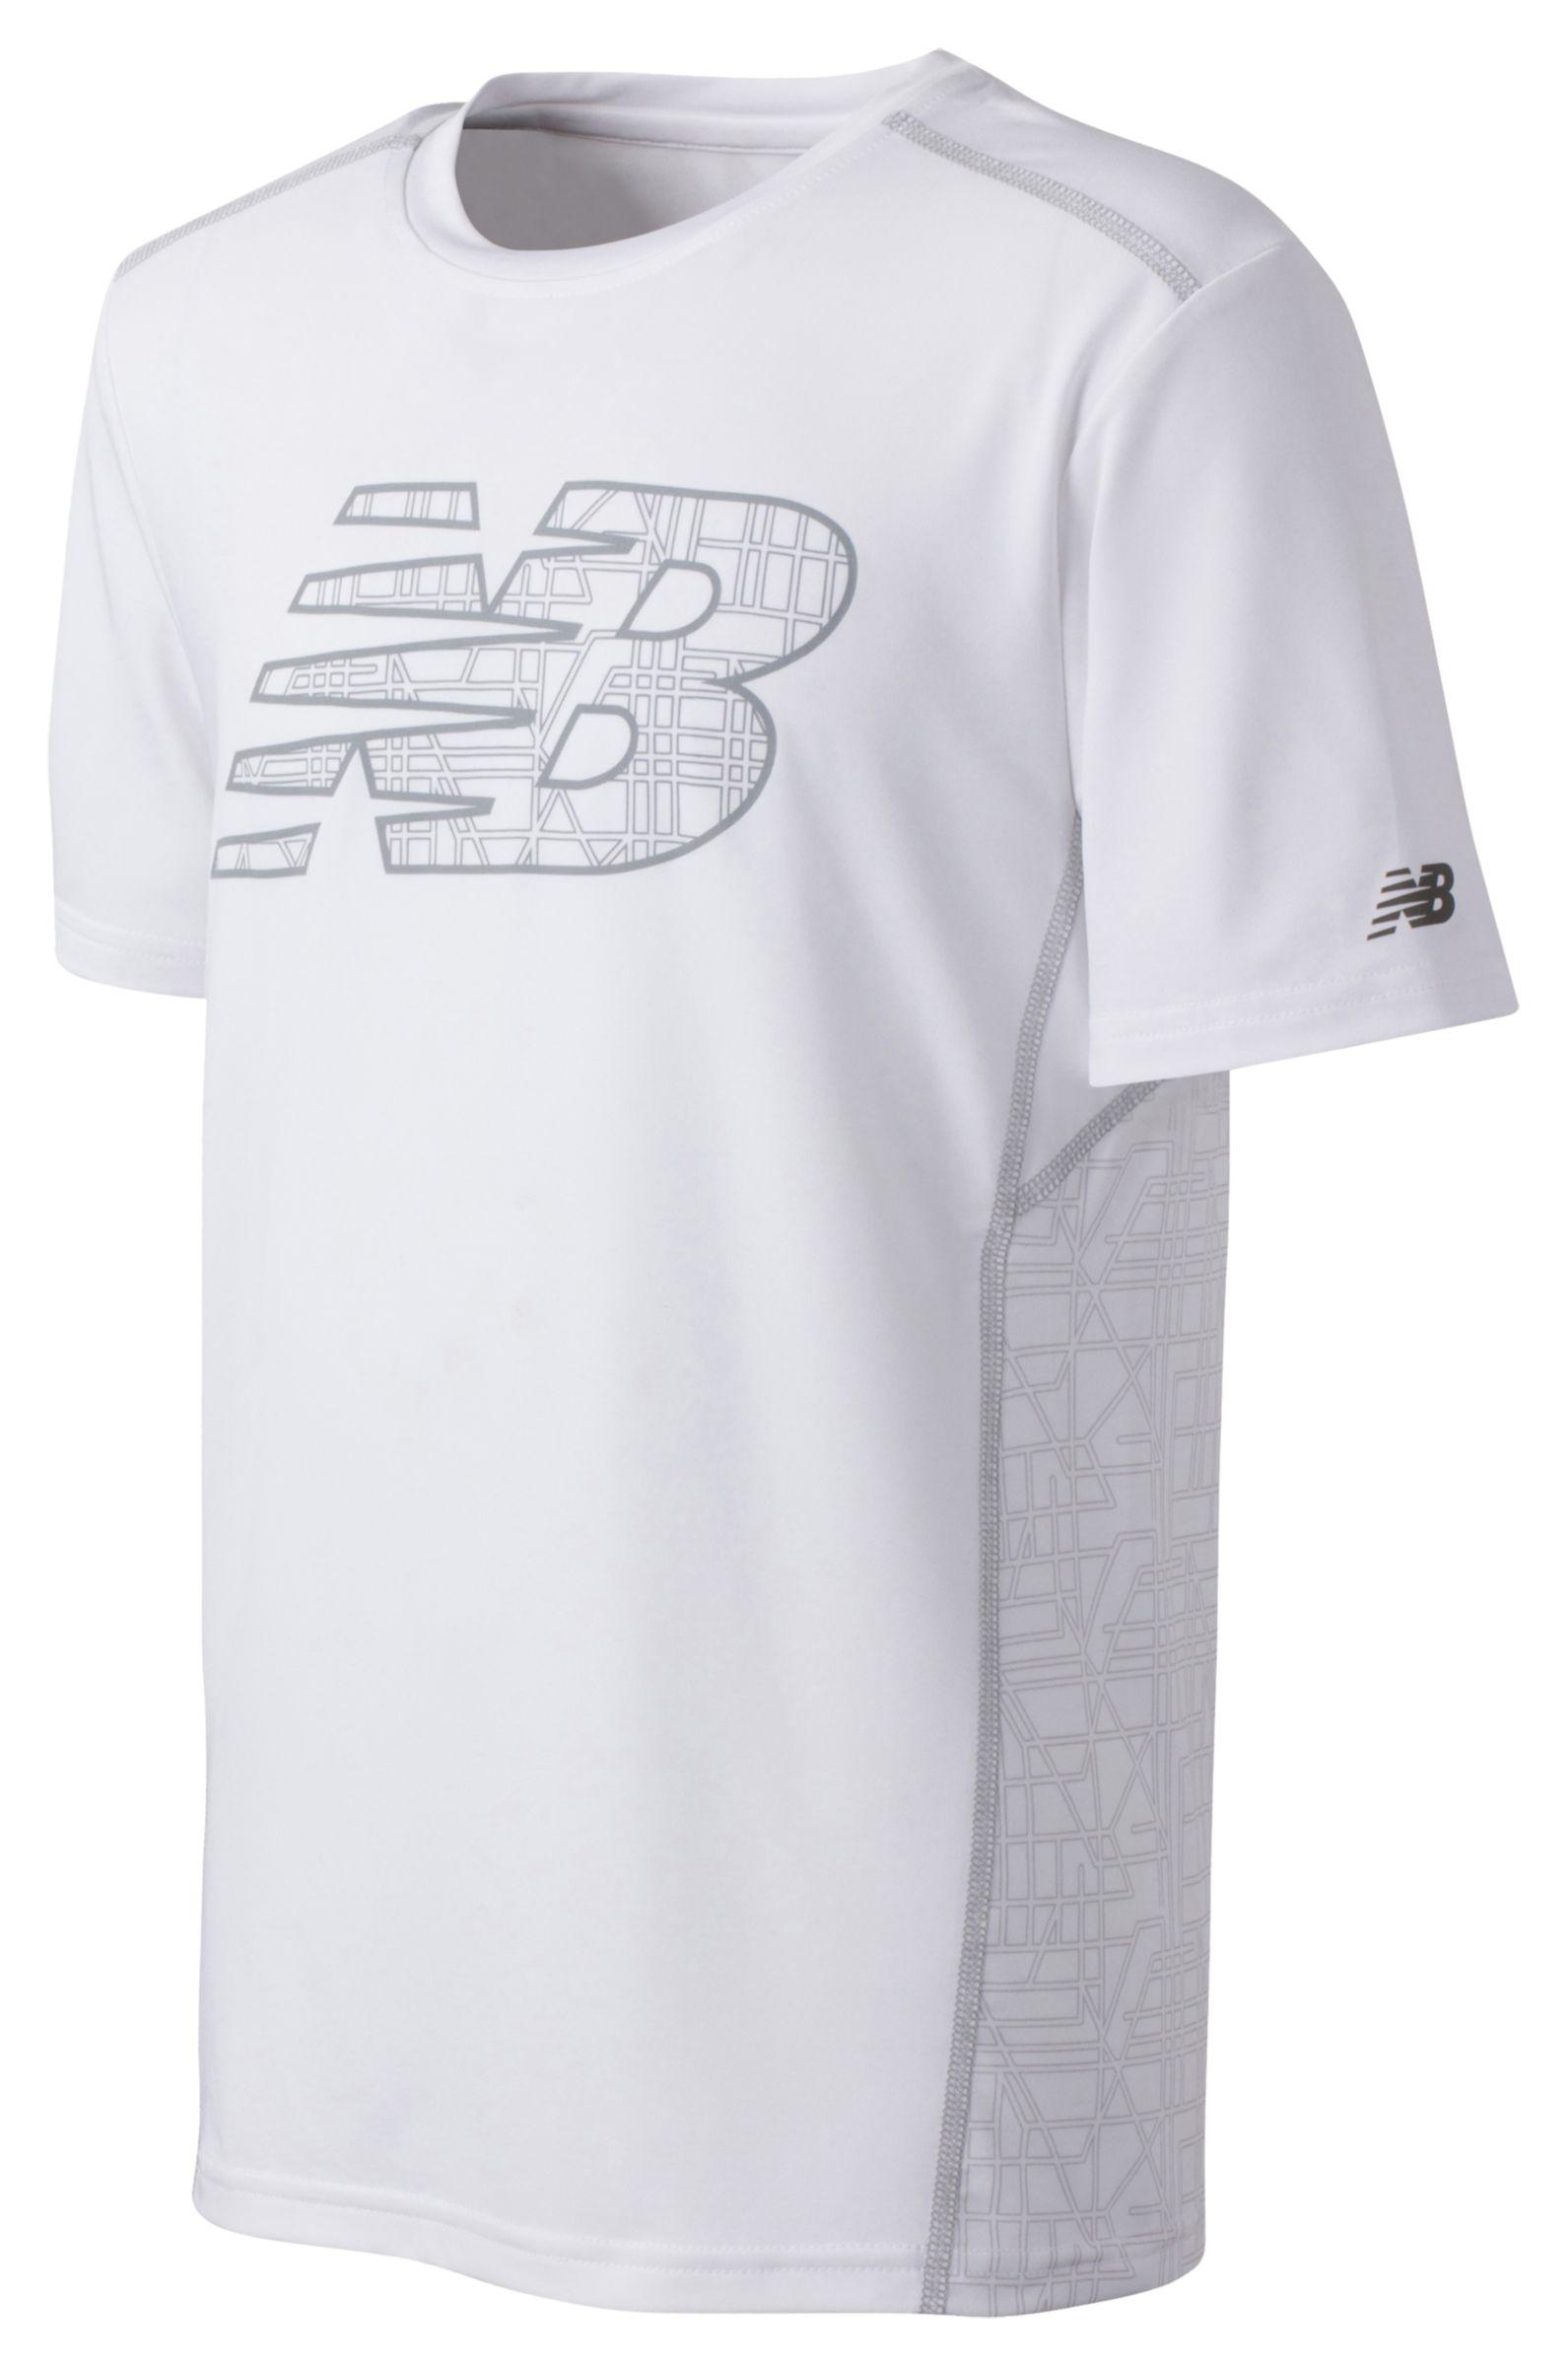 New Balance Boys Short Sleeve Printed Performance Tee White